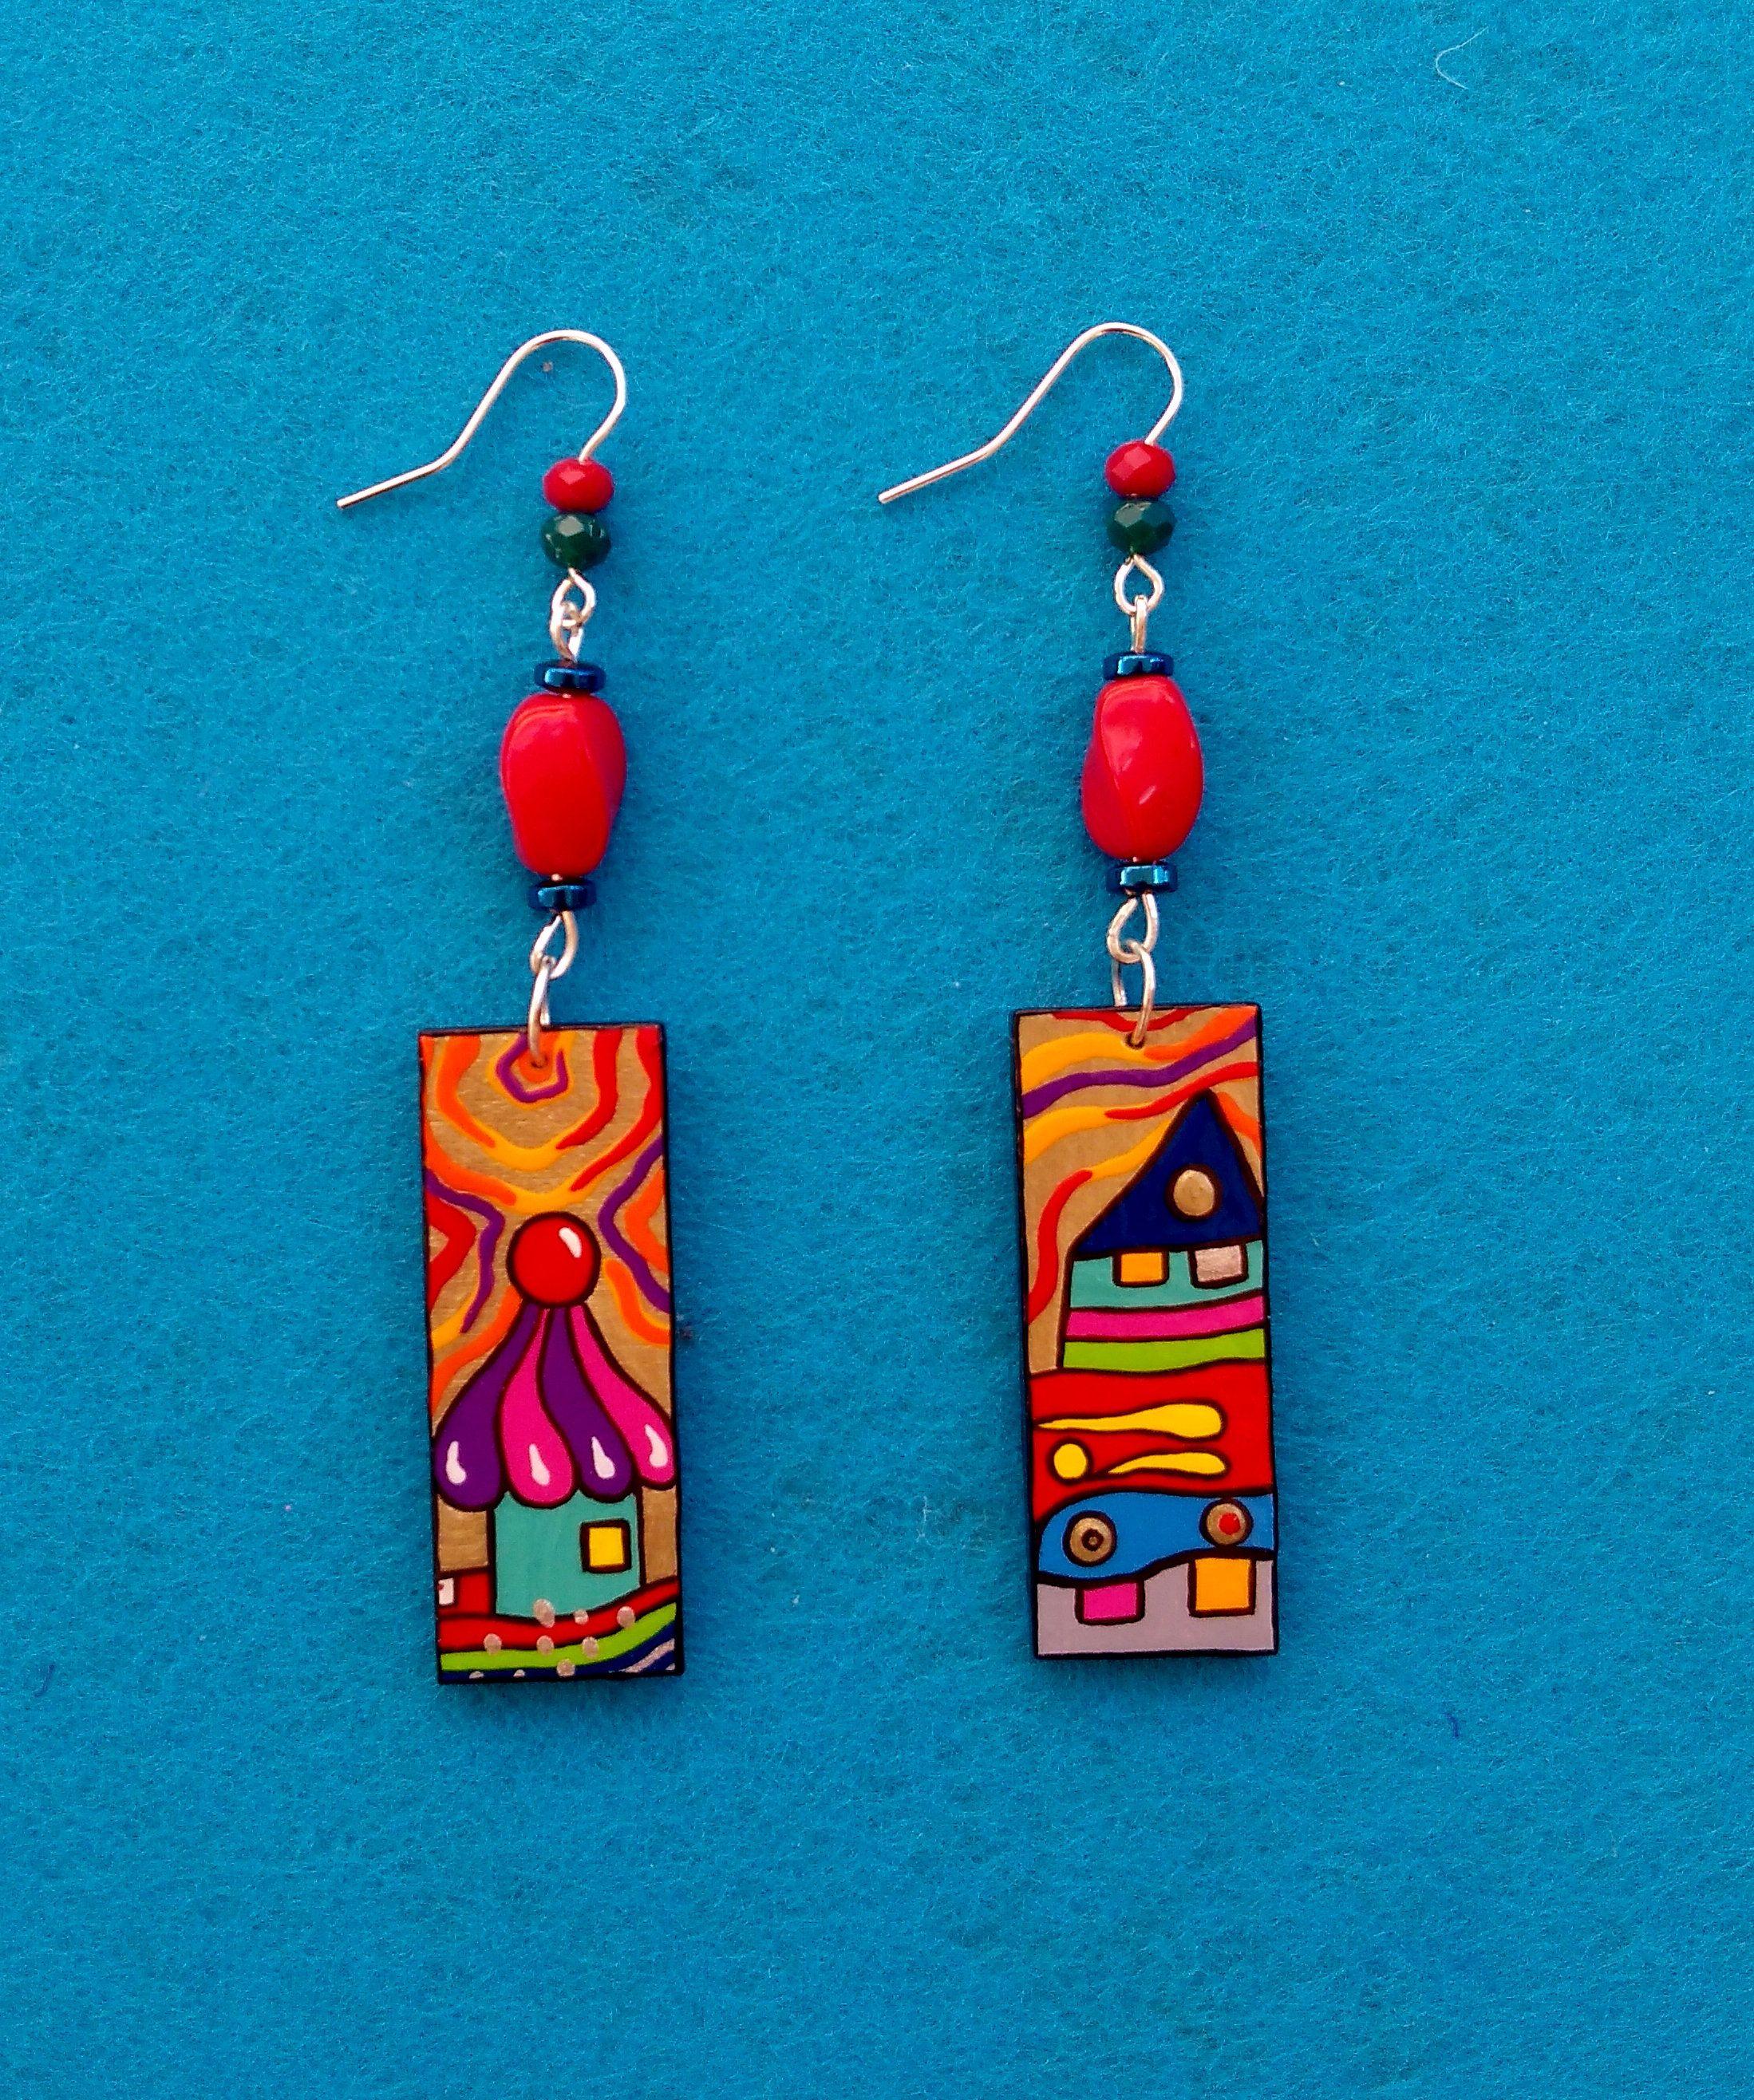 Earrings with image of Hunderwasser artistic earrings